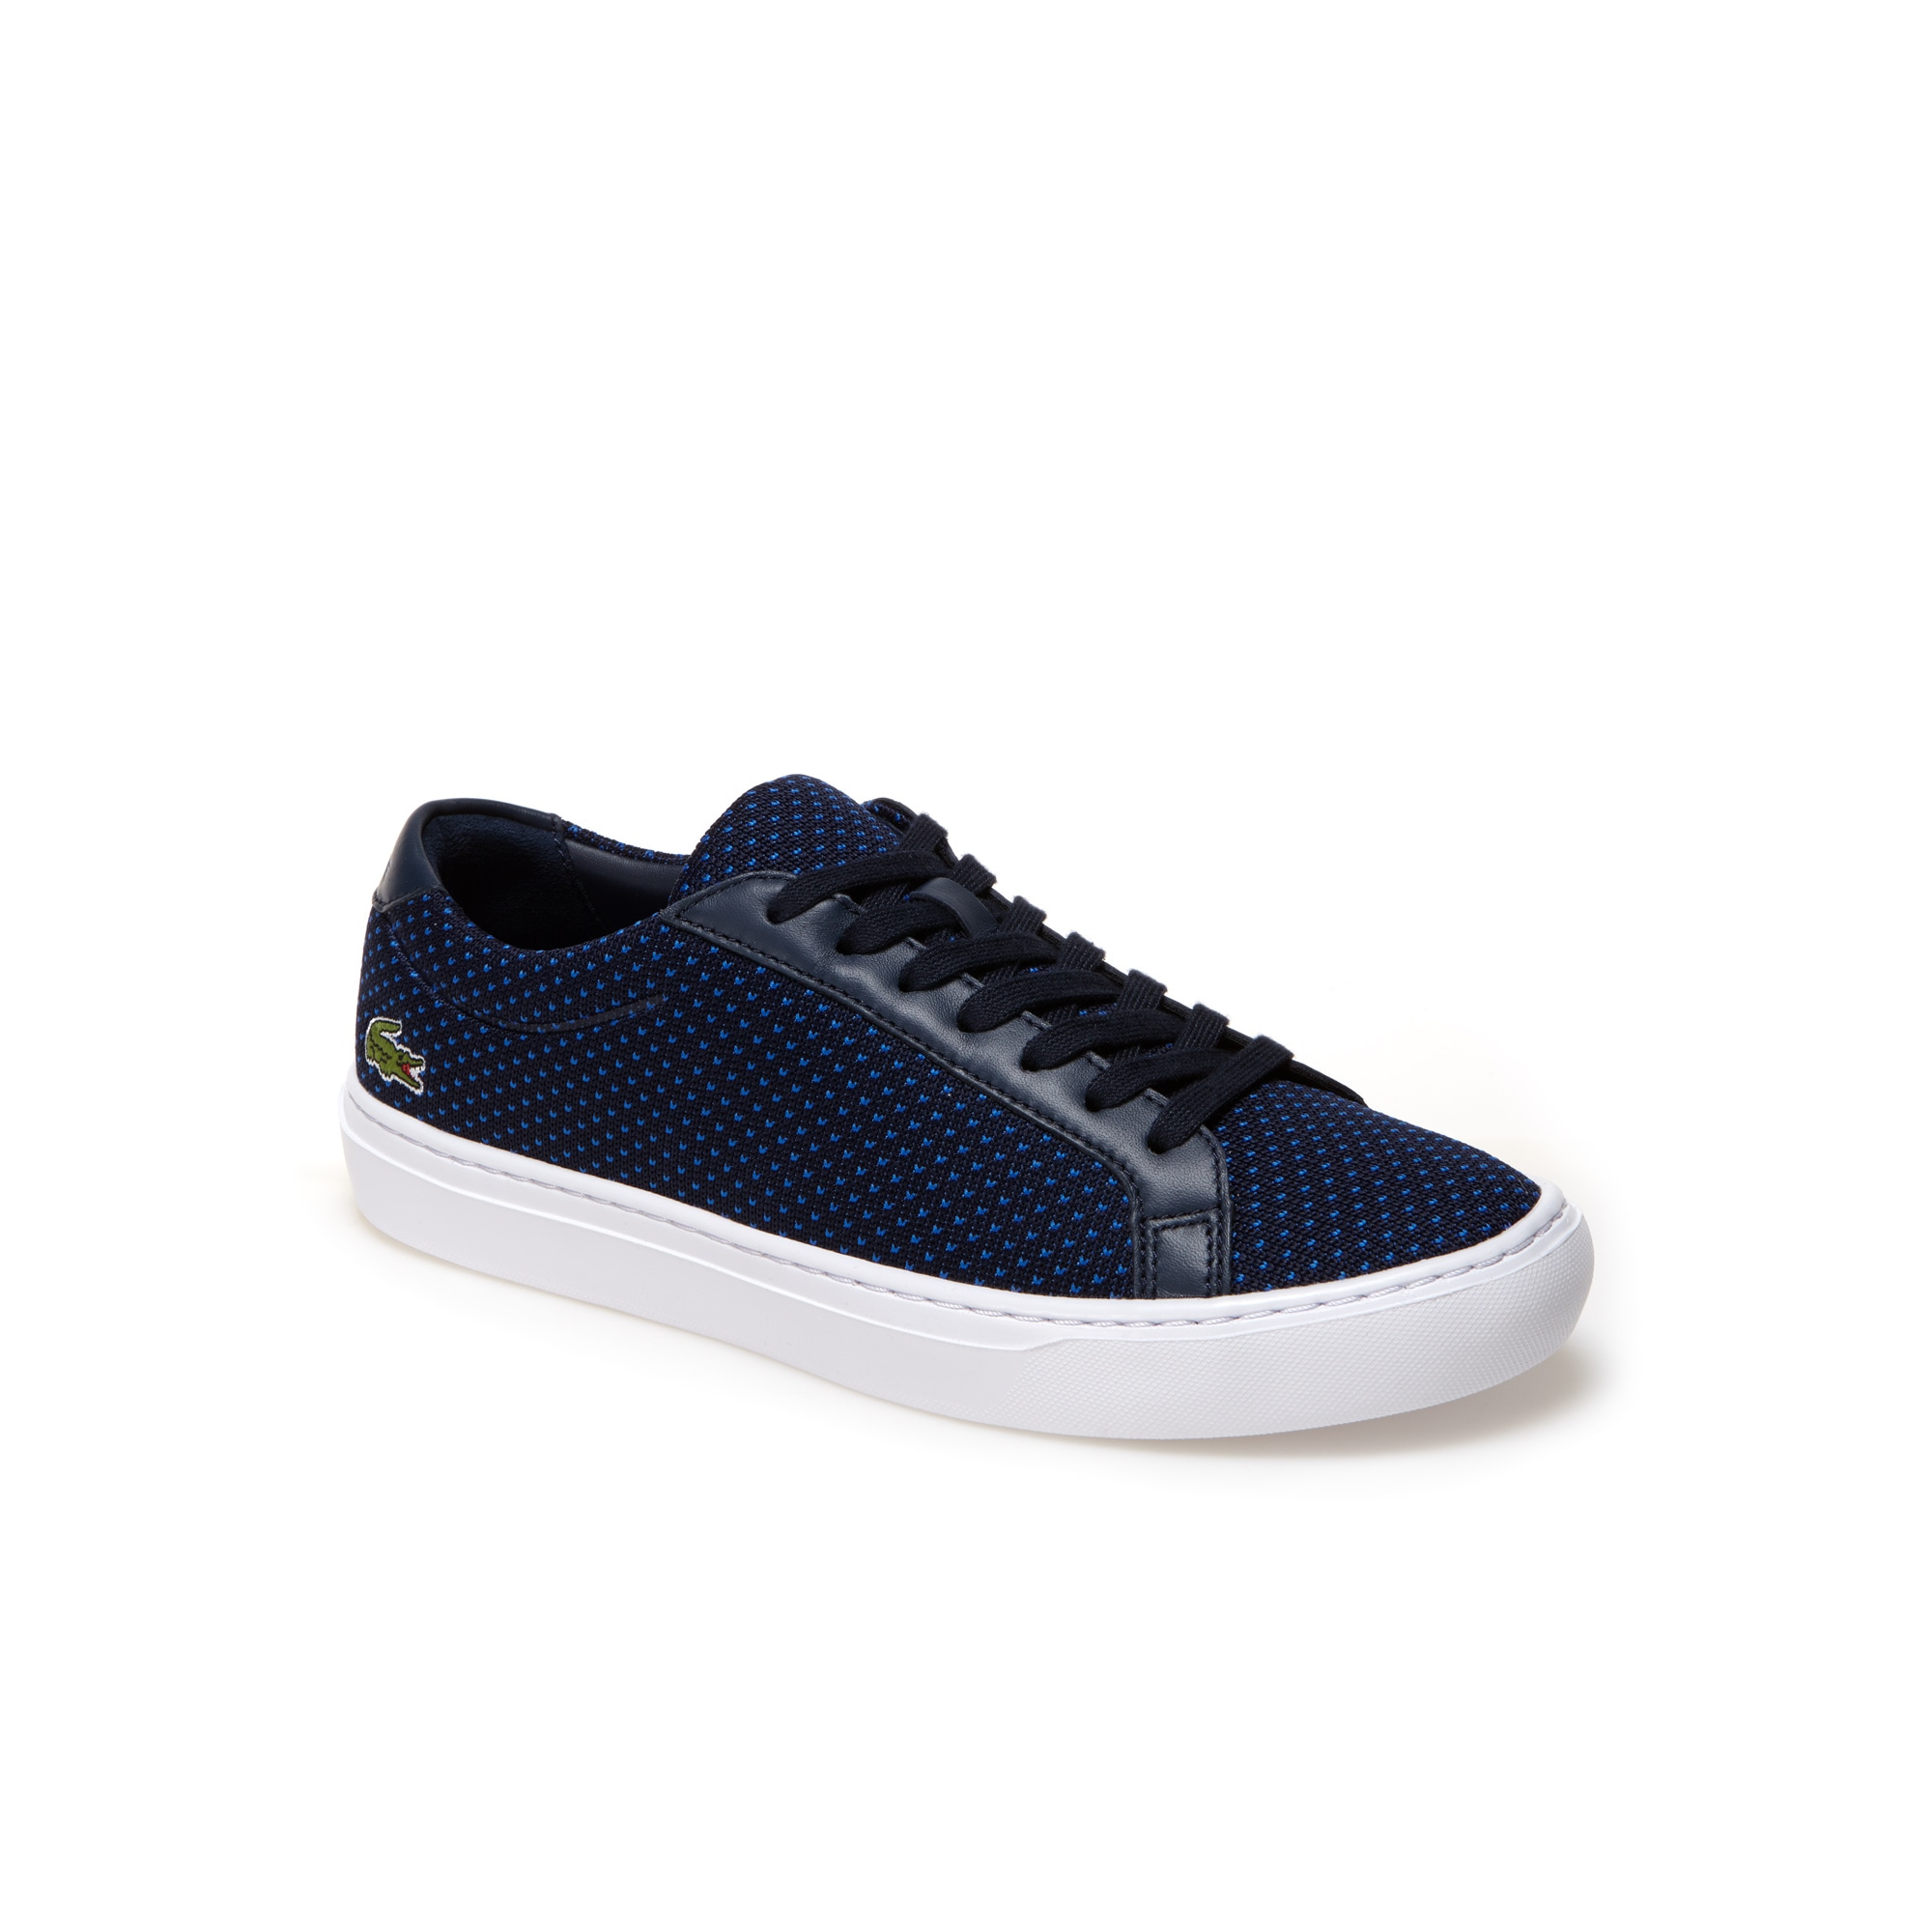 Sneakers L.12.12 in tessuto leggero